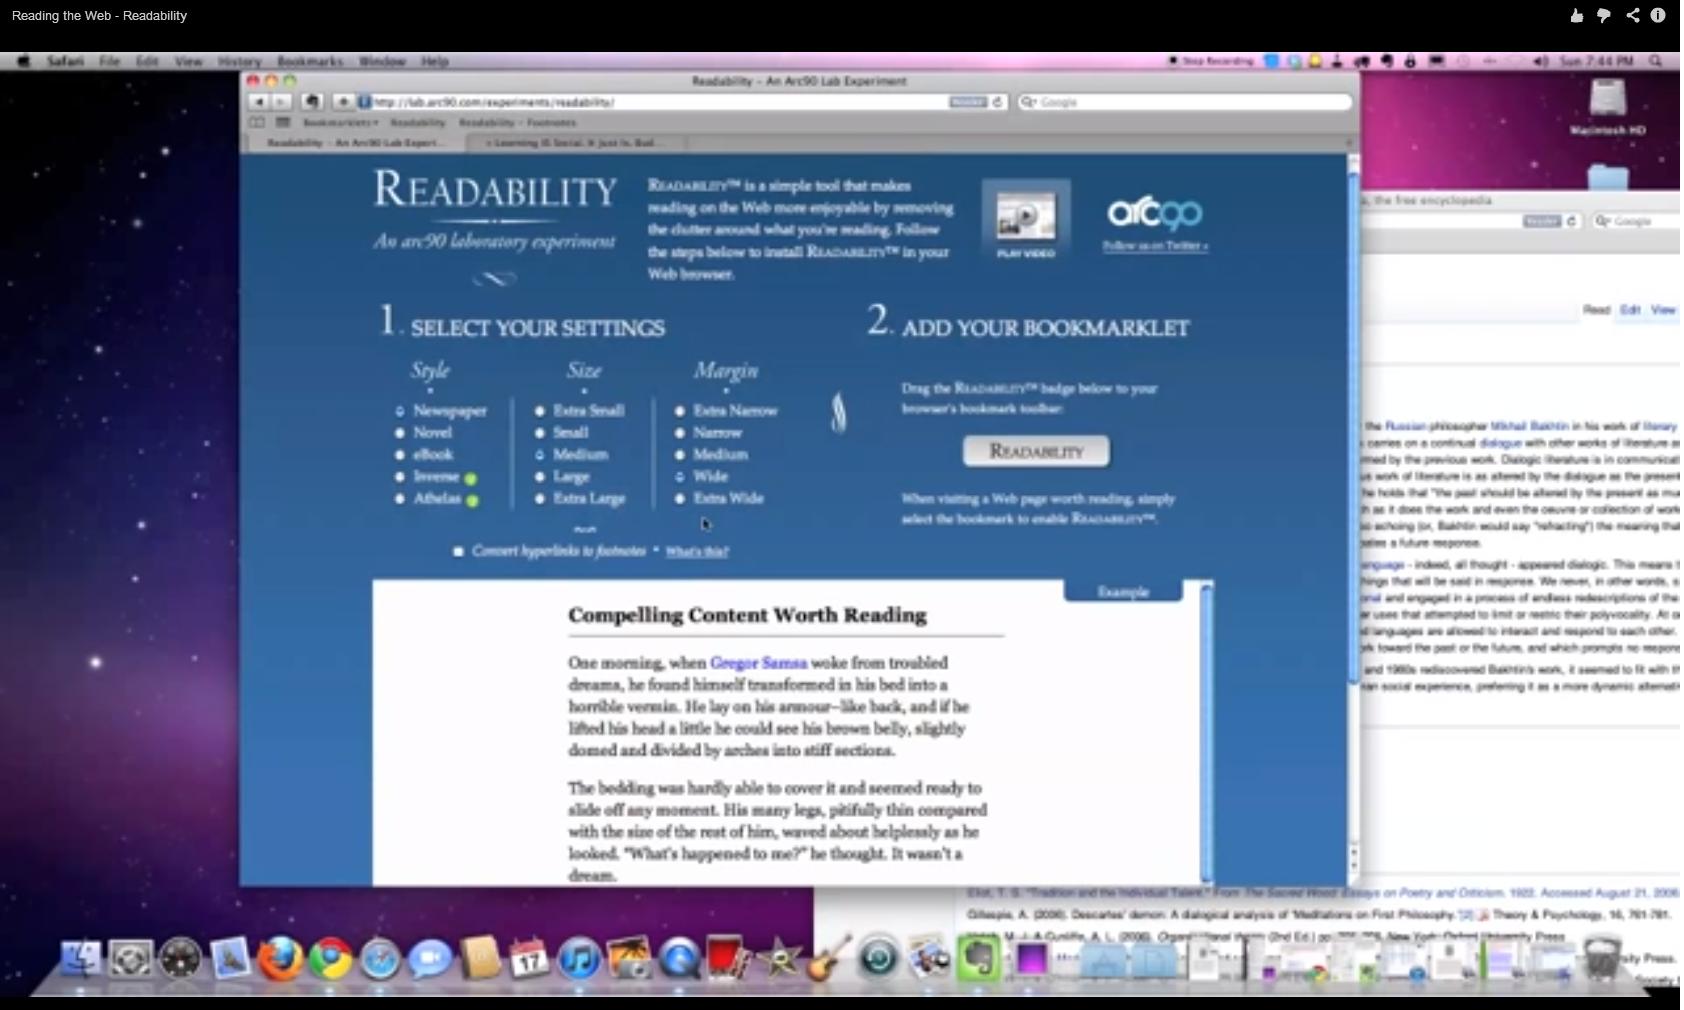 Reading the Web - Readability